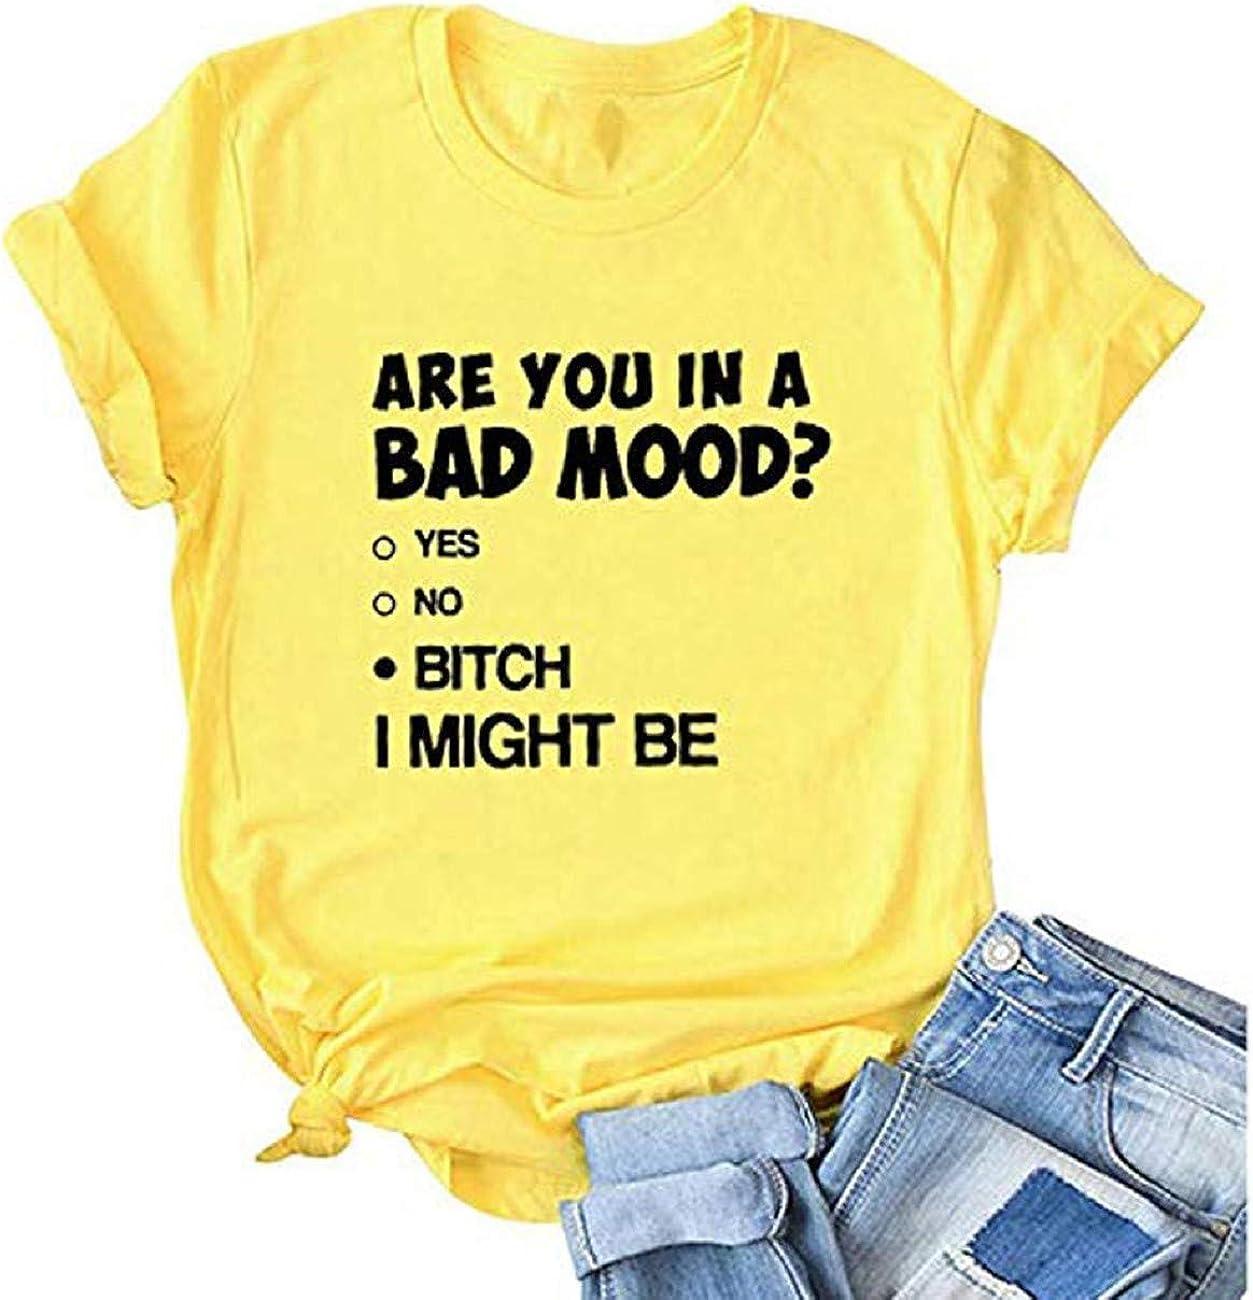 FAPIZI Women T-Shirt Letter Printing Short Sleeve Pullover Tops Raglan O Neck Tee Tunic Blouse